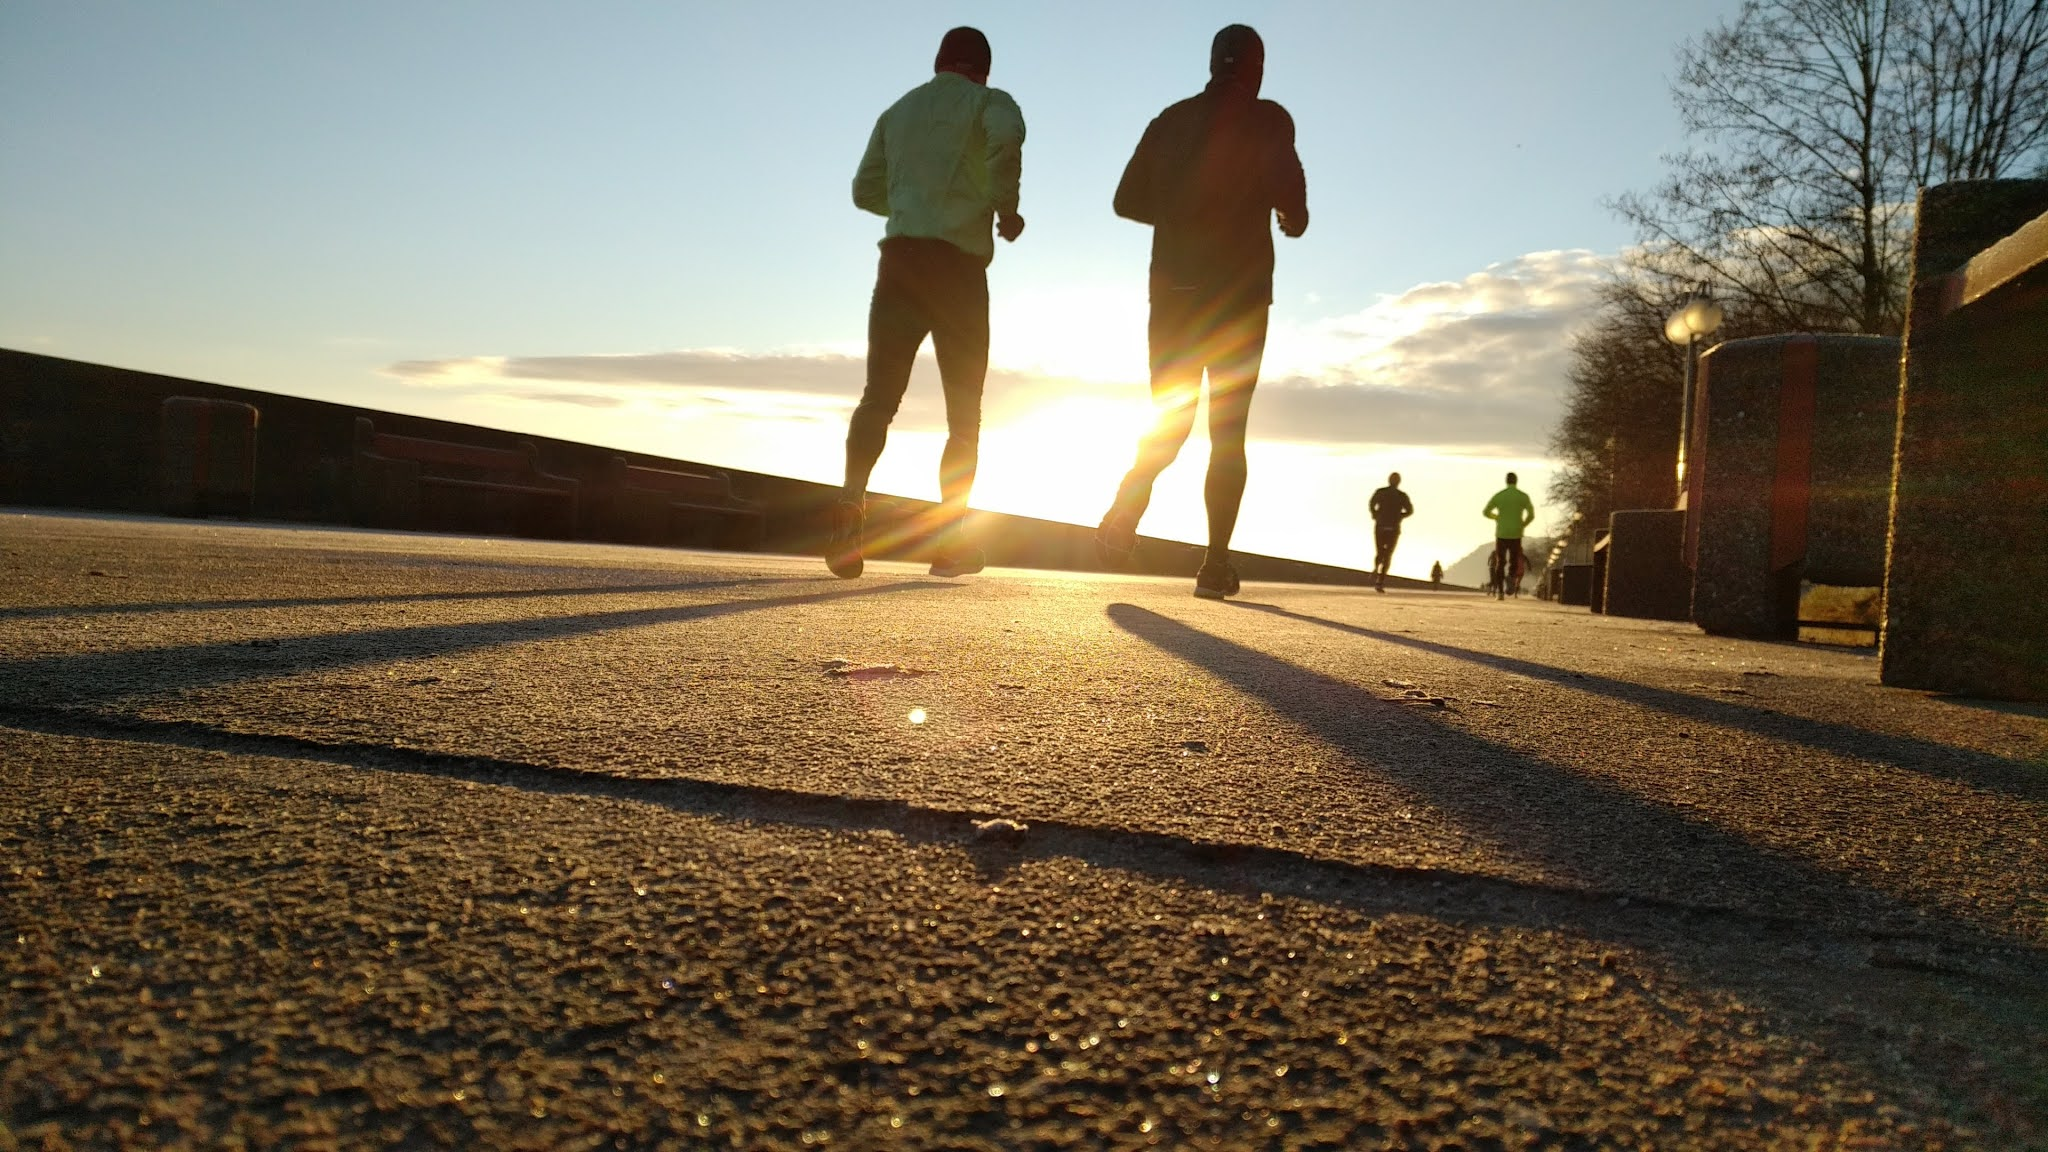 Lockdown: Διευκρινίσεις για ατομική άθληση και ομαδικά αθλήματα